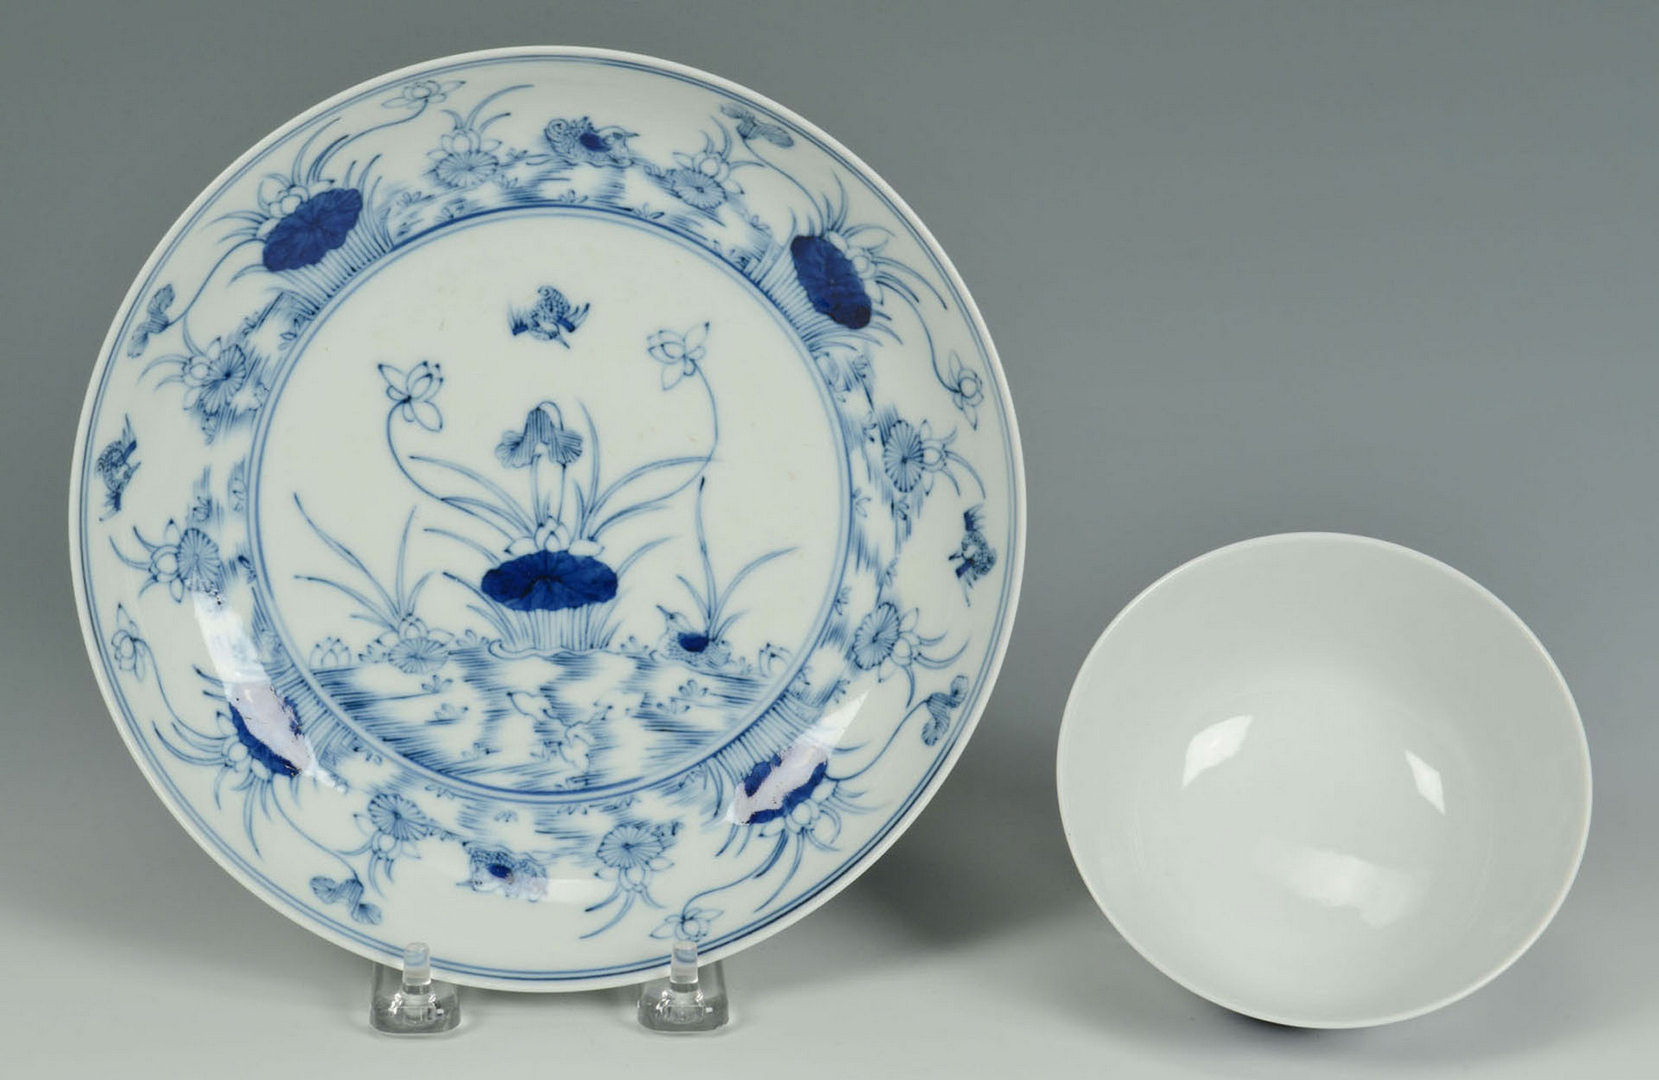 Lot 453: 2 Chinese Blue & White Porcelain Bowls